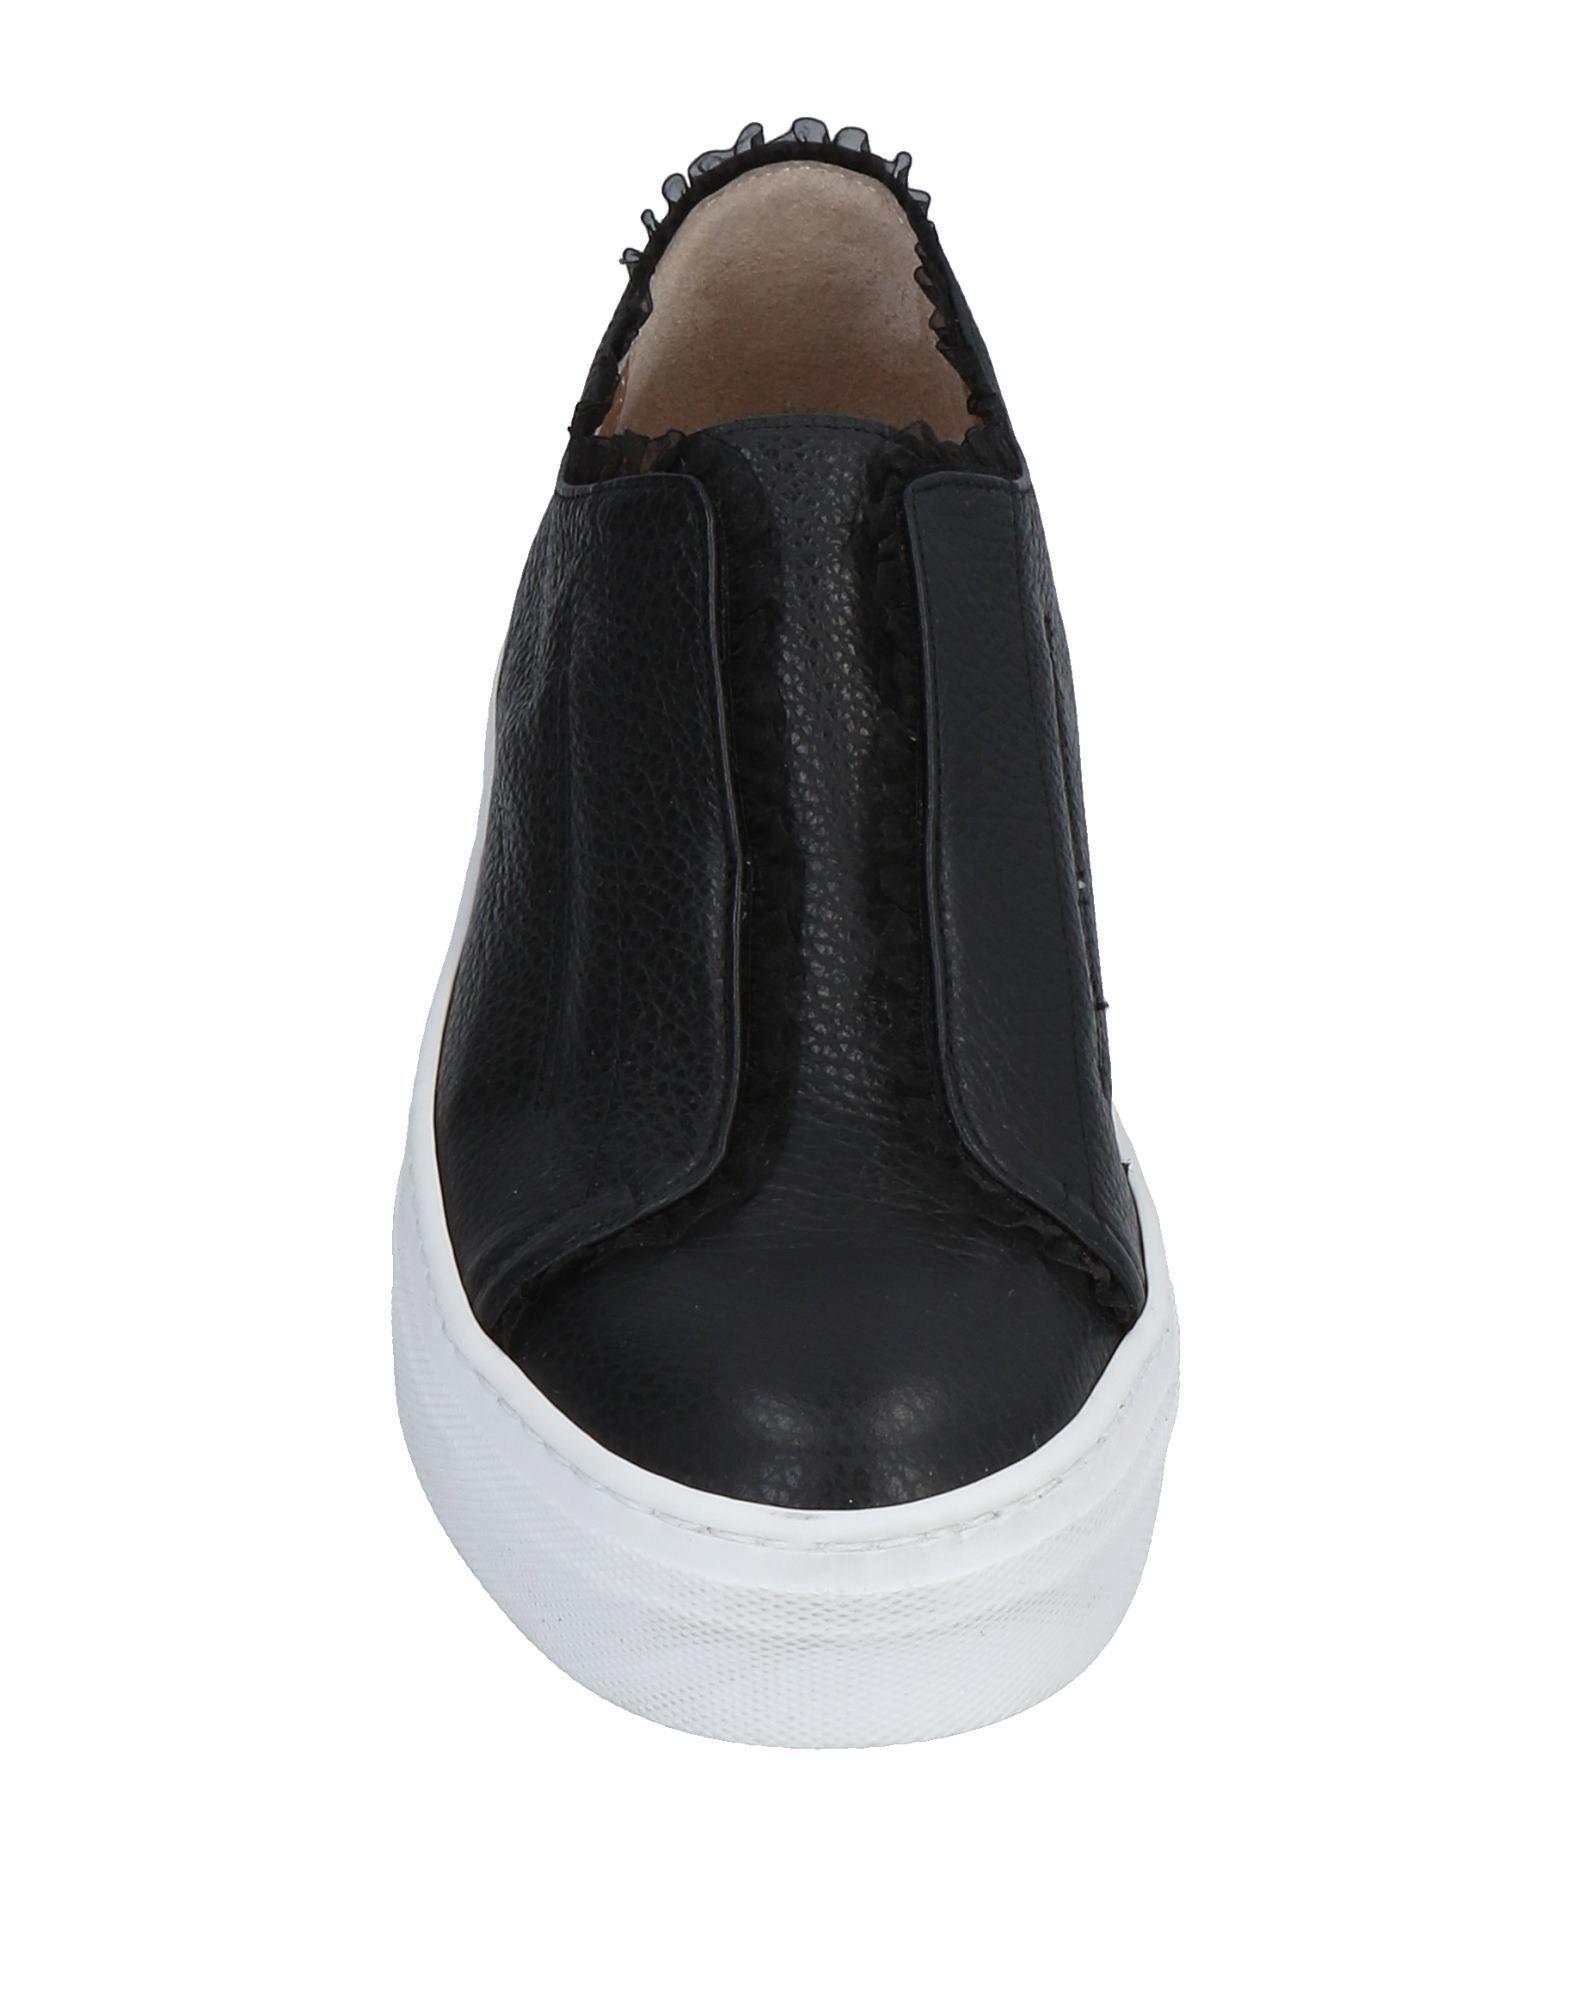 Nila & & & Nila Sneakers - Women Nila & Nila Sneakers online on  United Kingdom - 11473395EL d07670